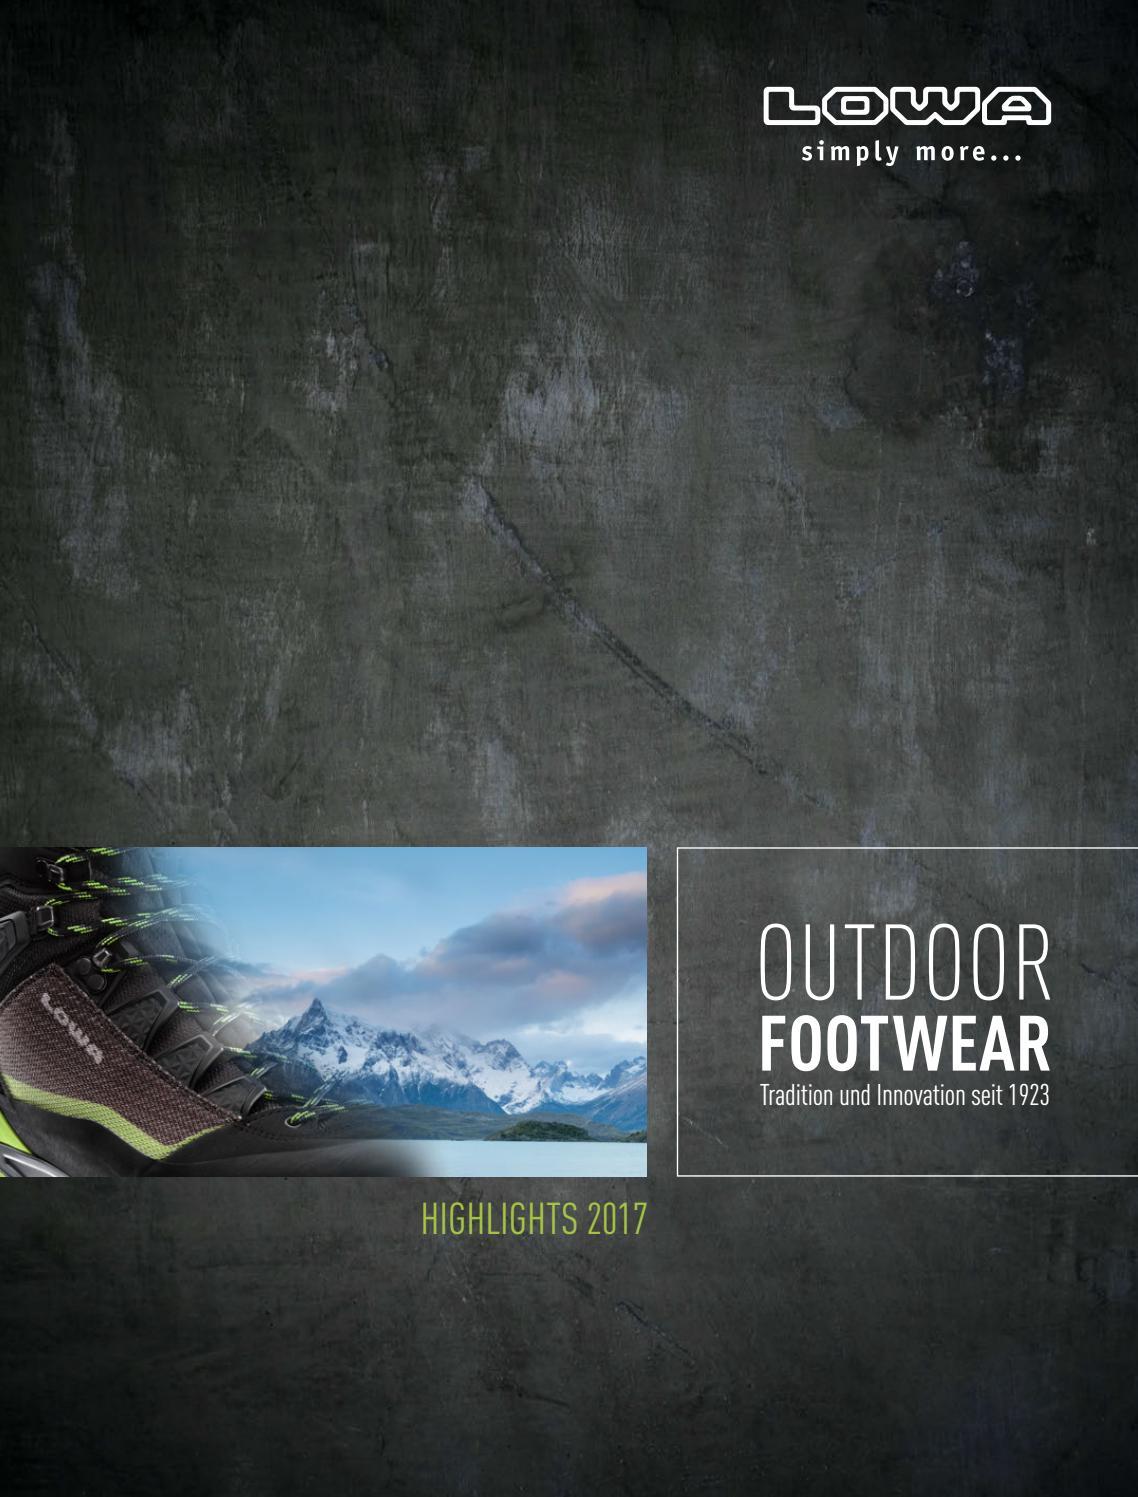 LOWA Outdoor Footwear Highlights 2017 by Schöffel LOWA